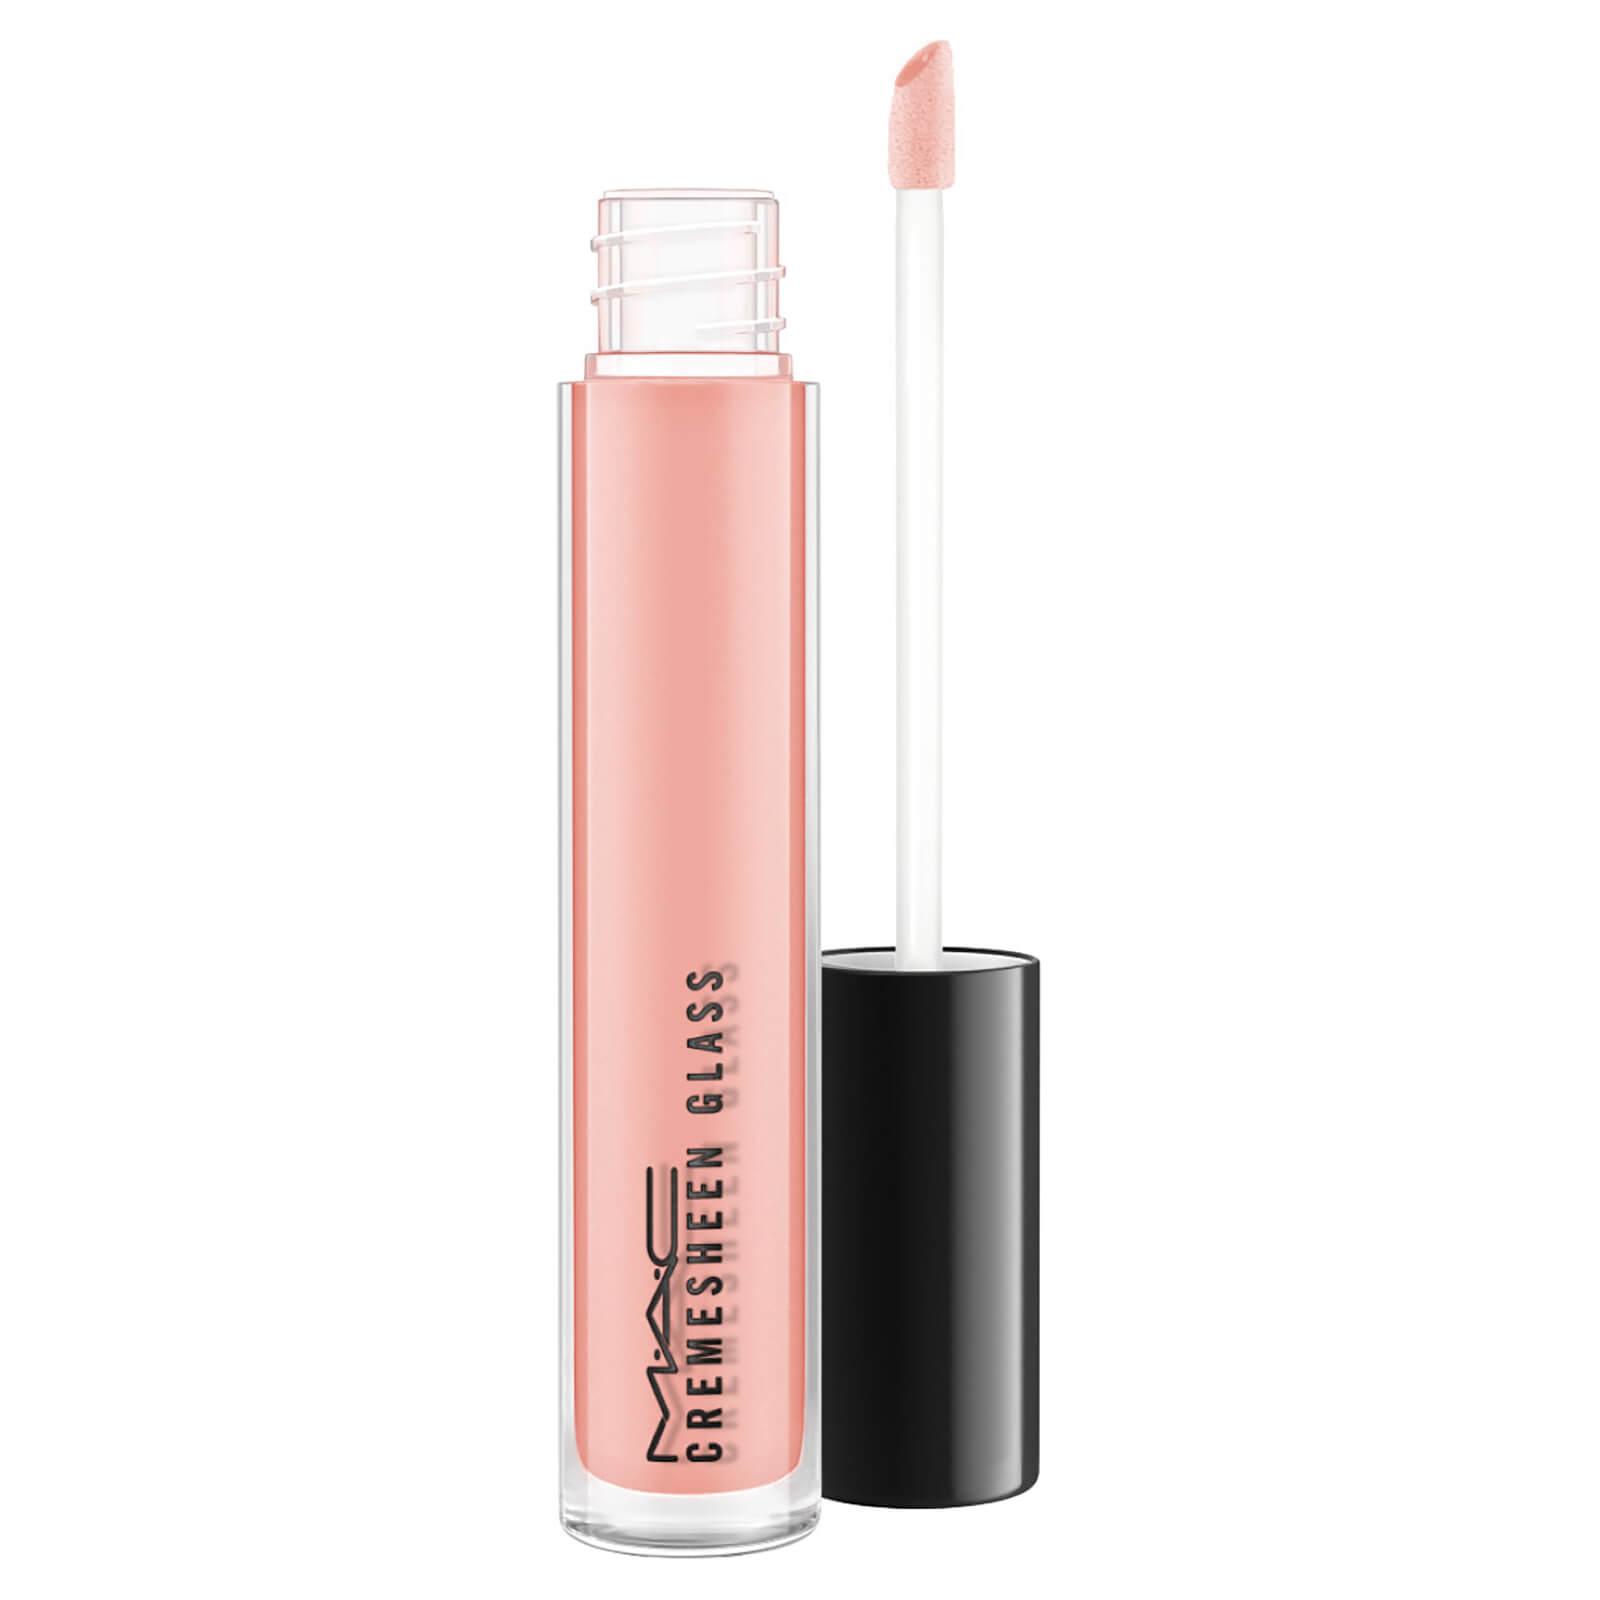 MAC Brillant à Lèvres Cremesheen Glass Lip Finish (teintes variées) - Boy Bait